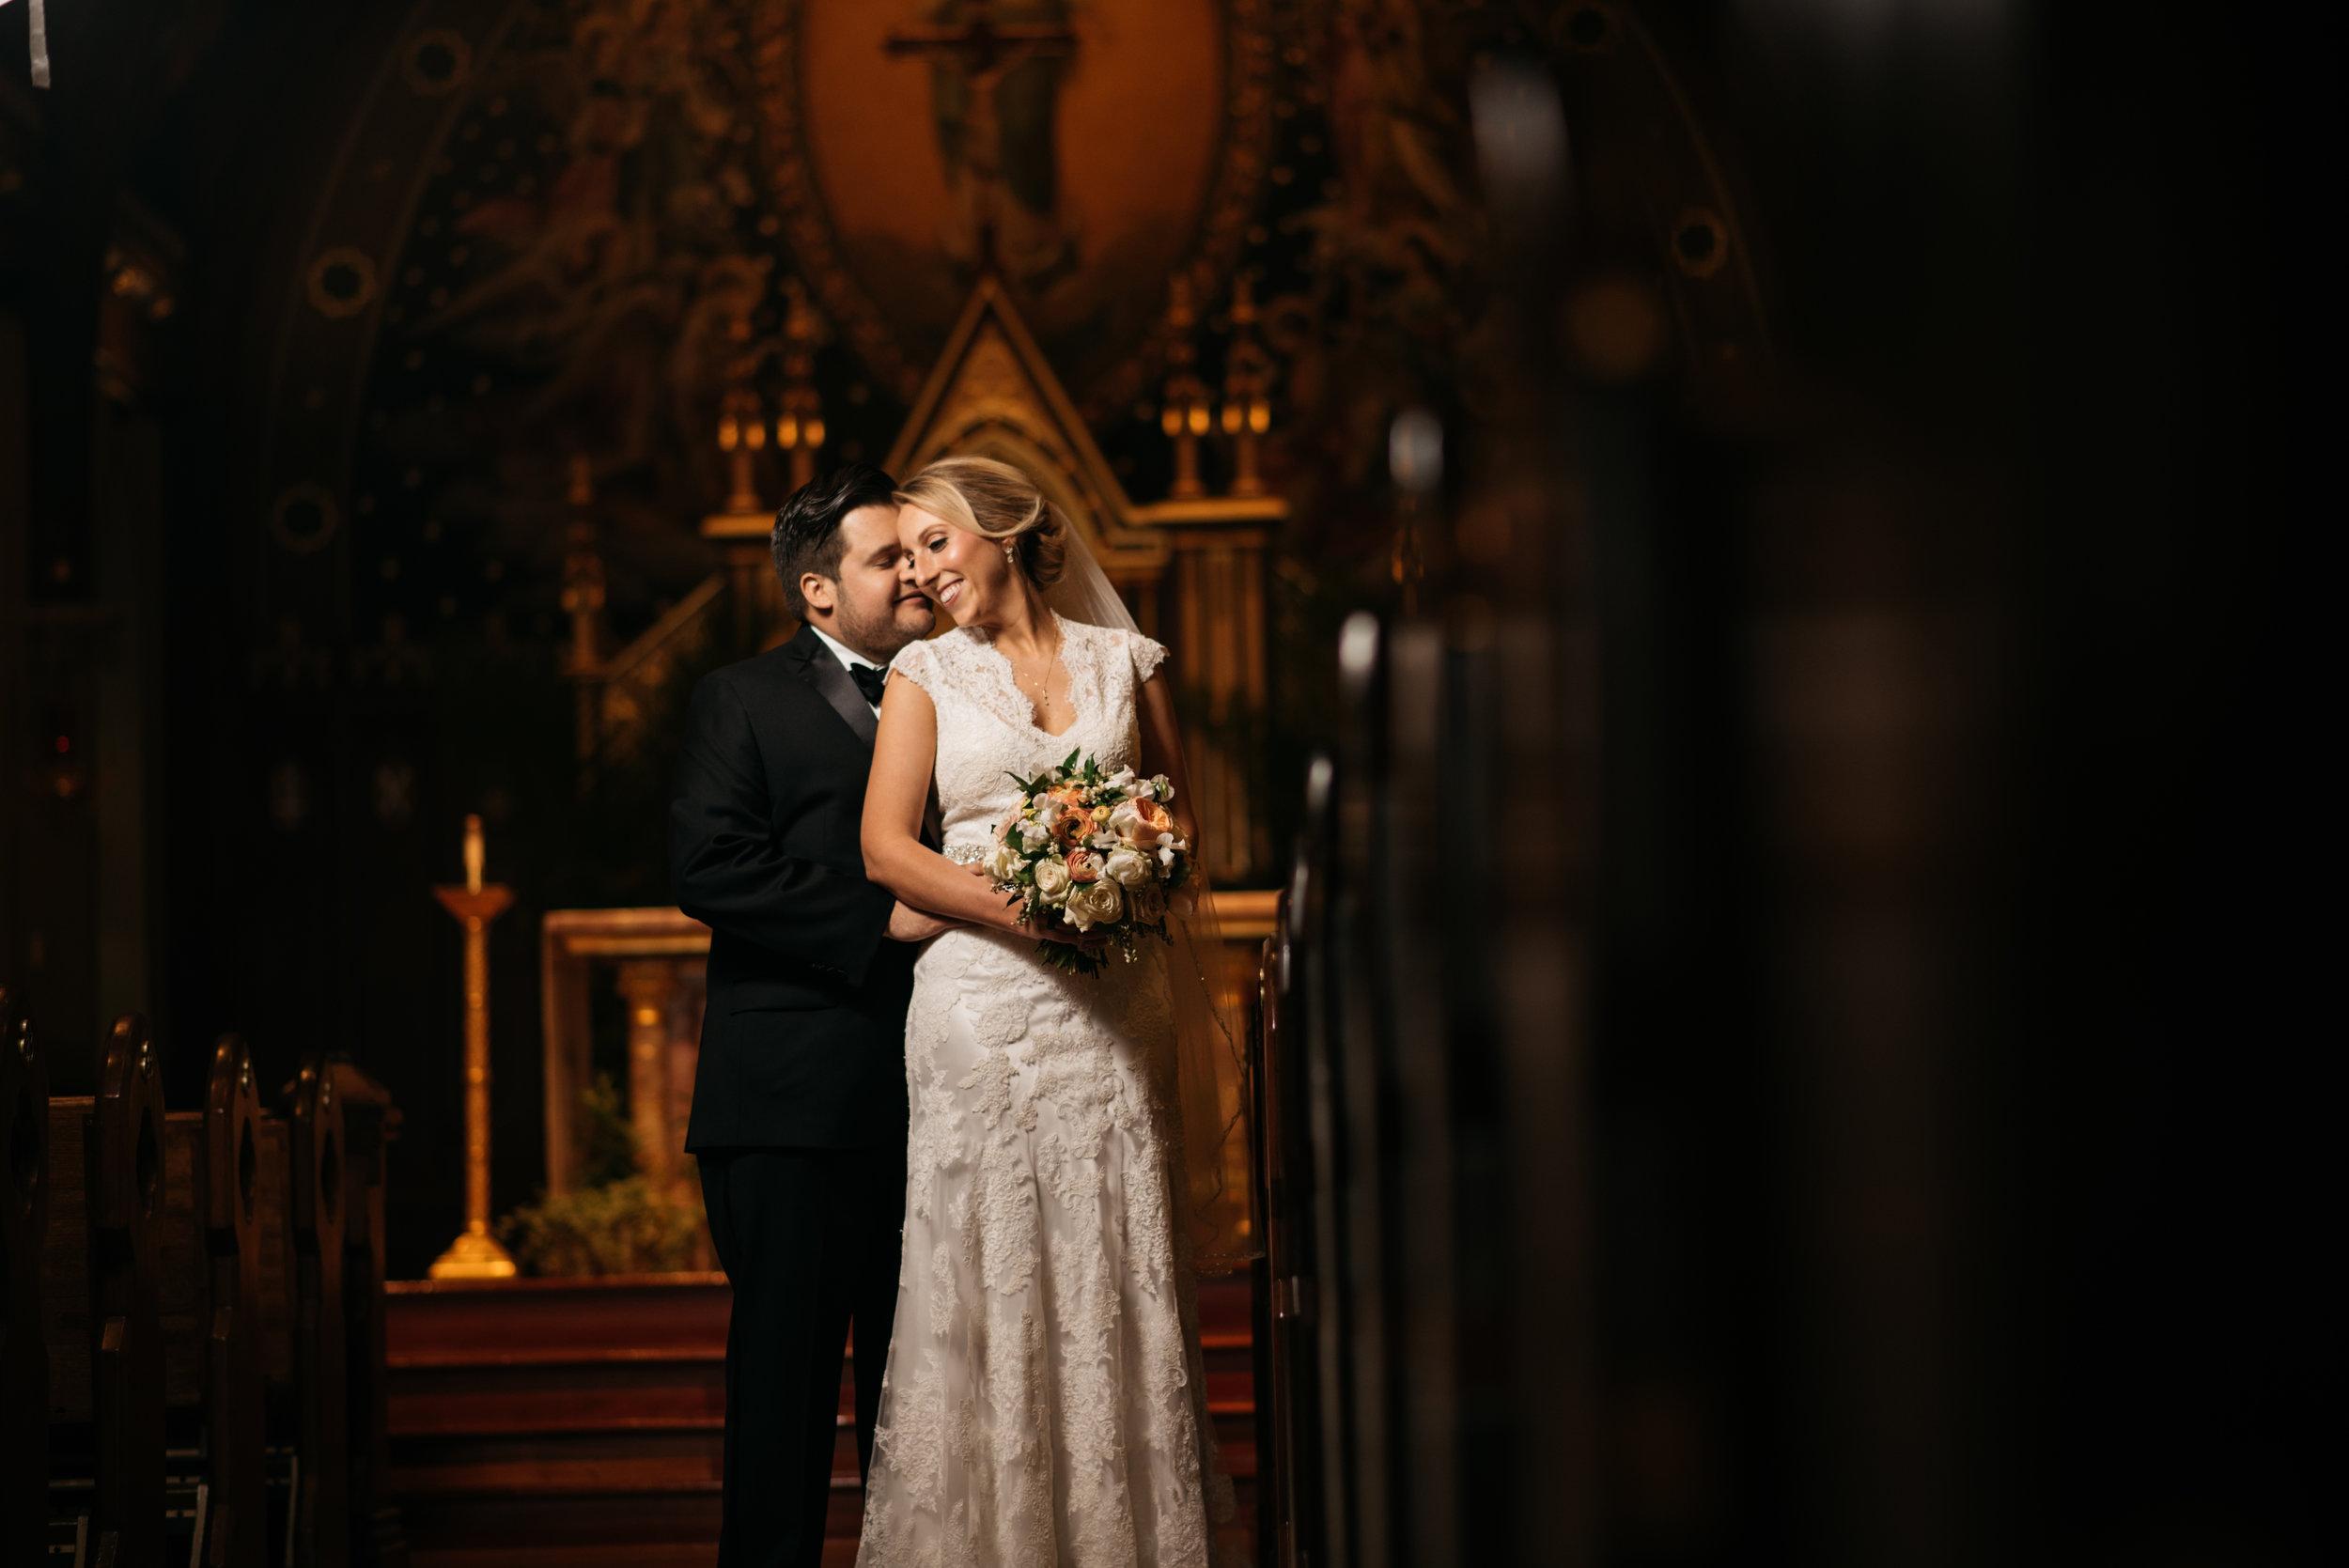 WeddingPhotos | NJPhotographer | Highlights-1-66.jpg